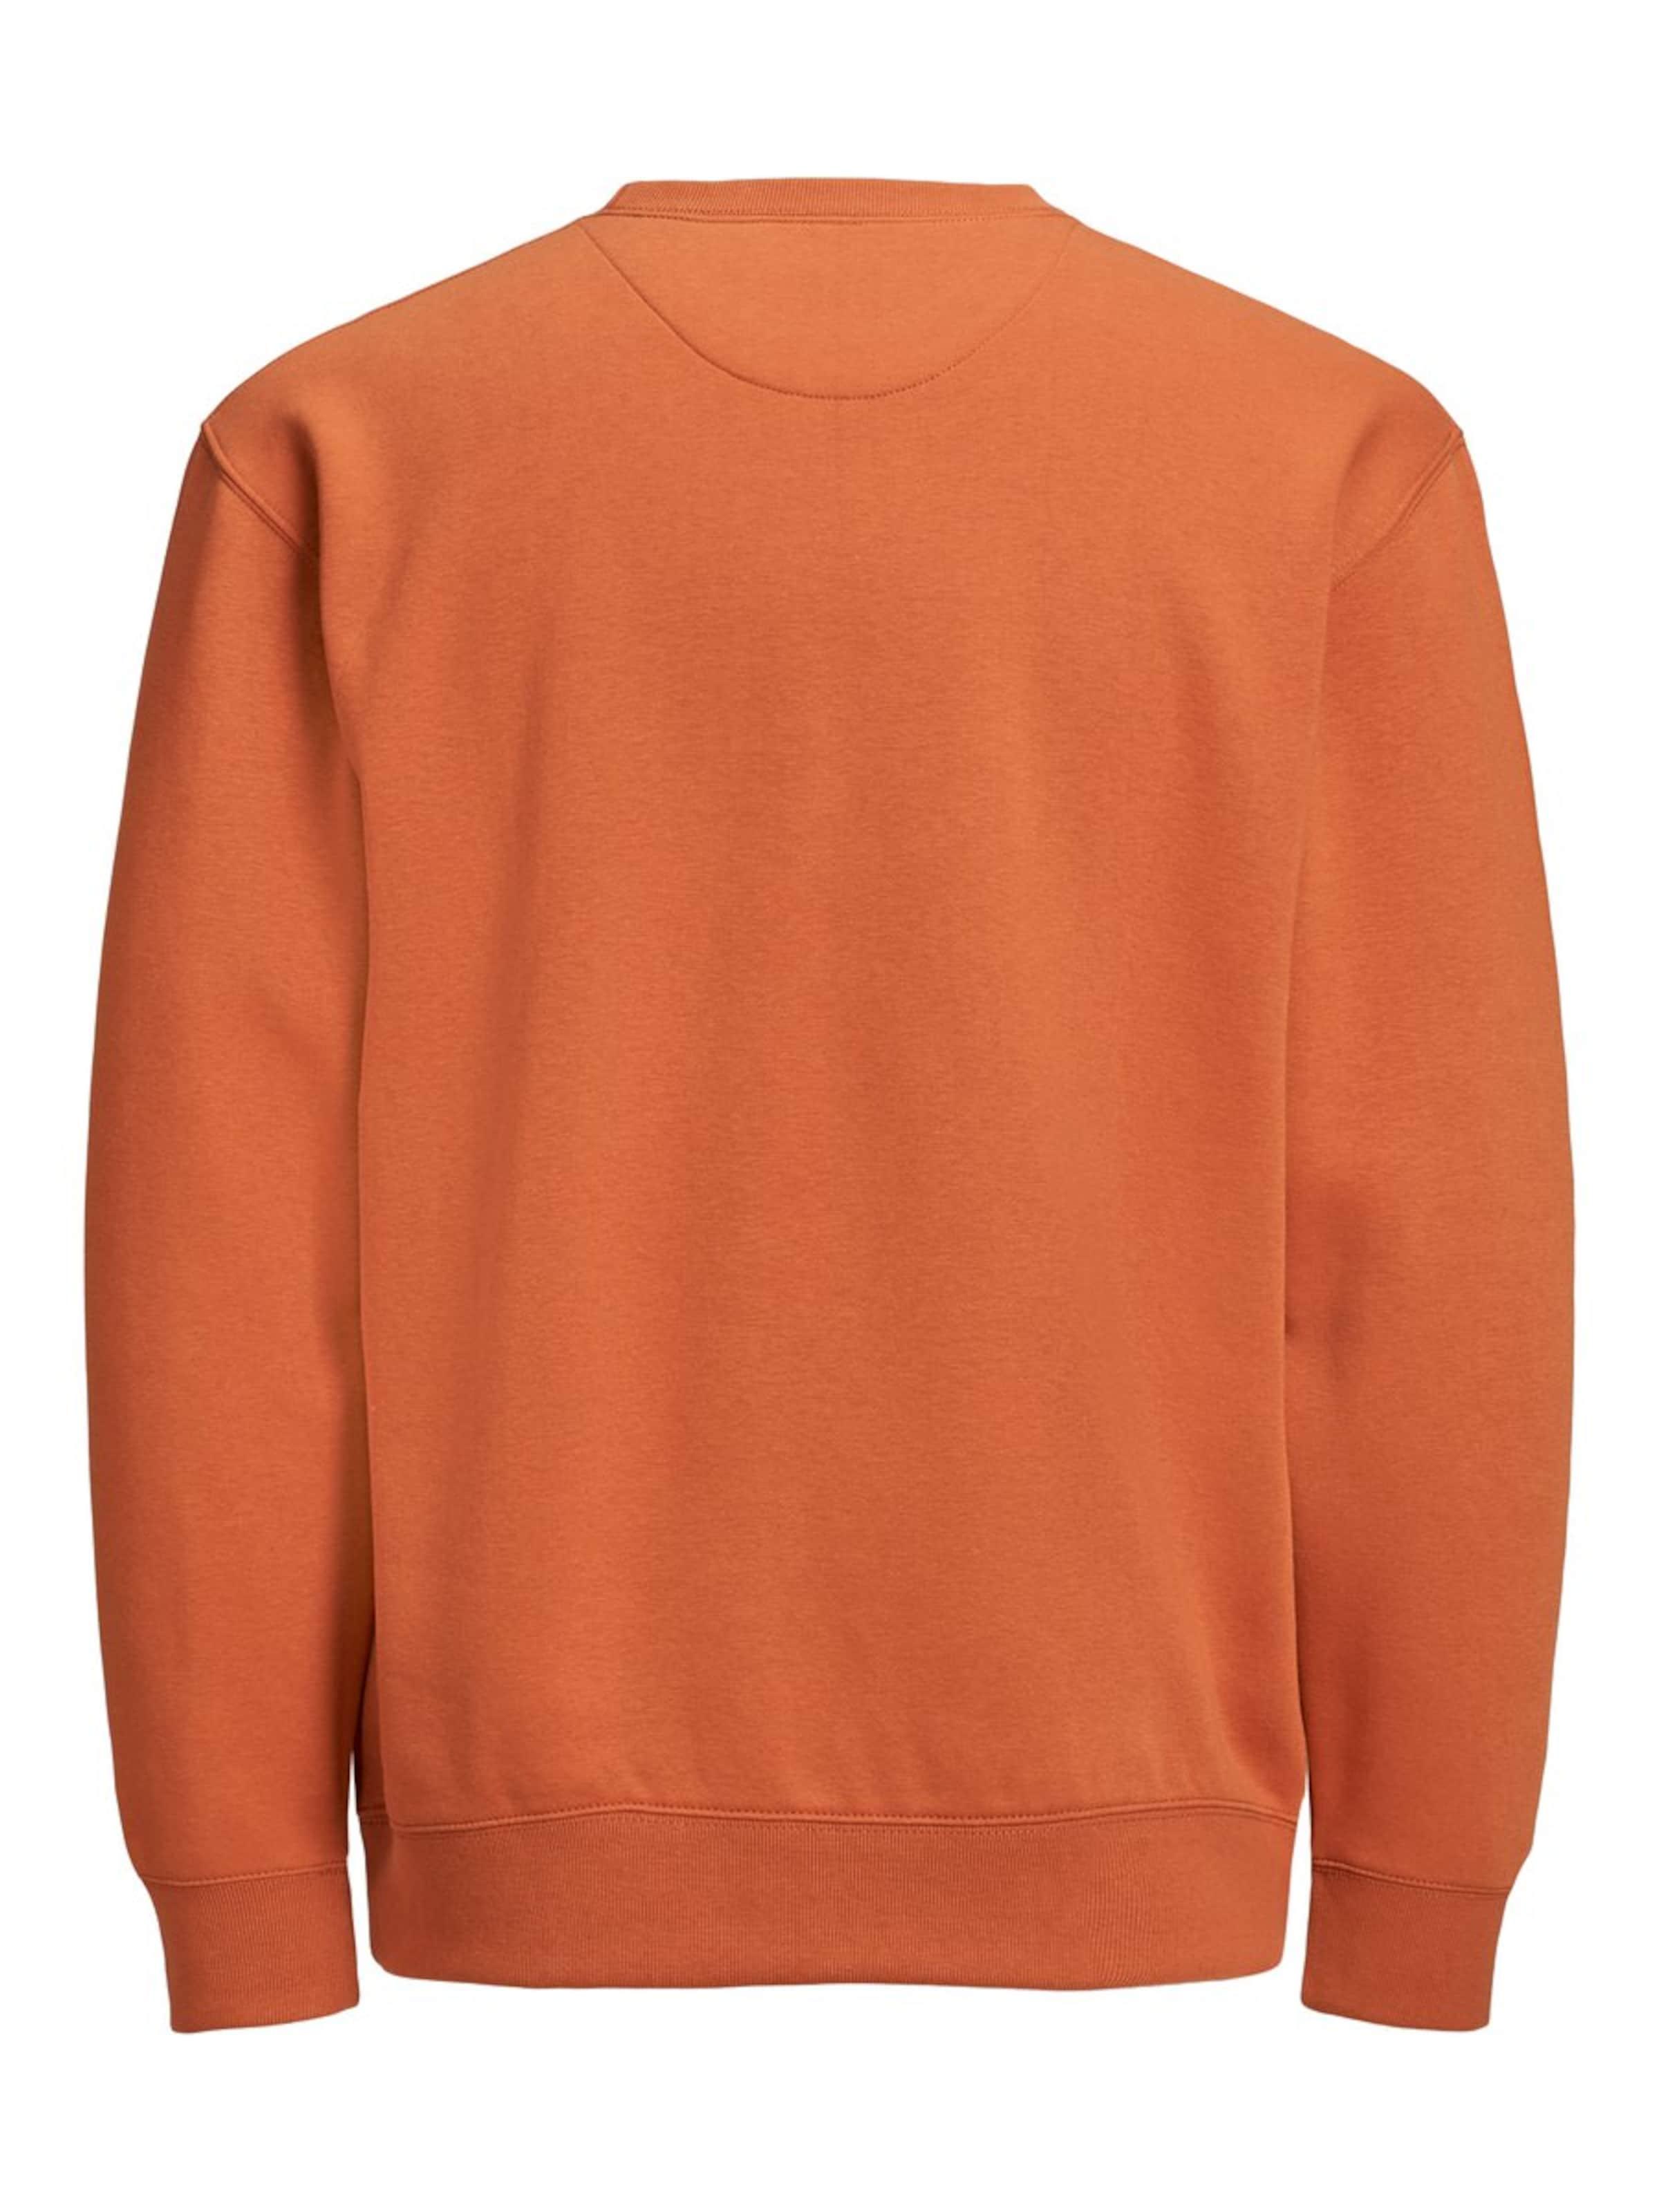 'soft' Vin Sweat En Lie Jackamp; De Jones shirt 0PwmNvy8nO